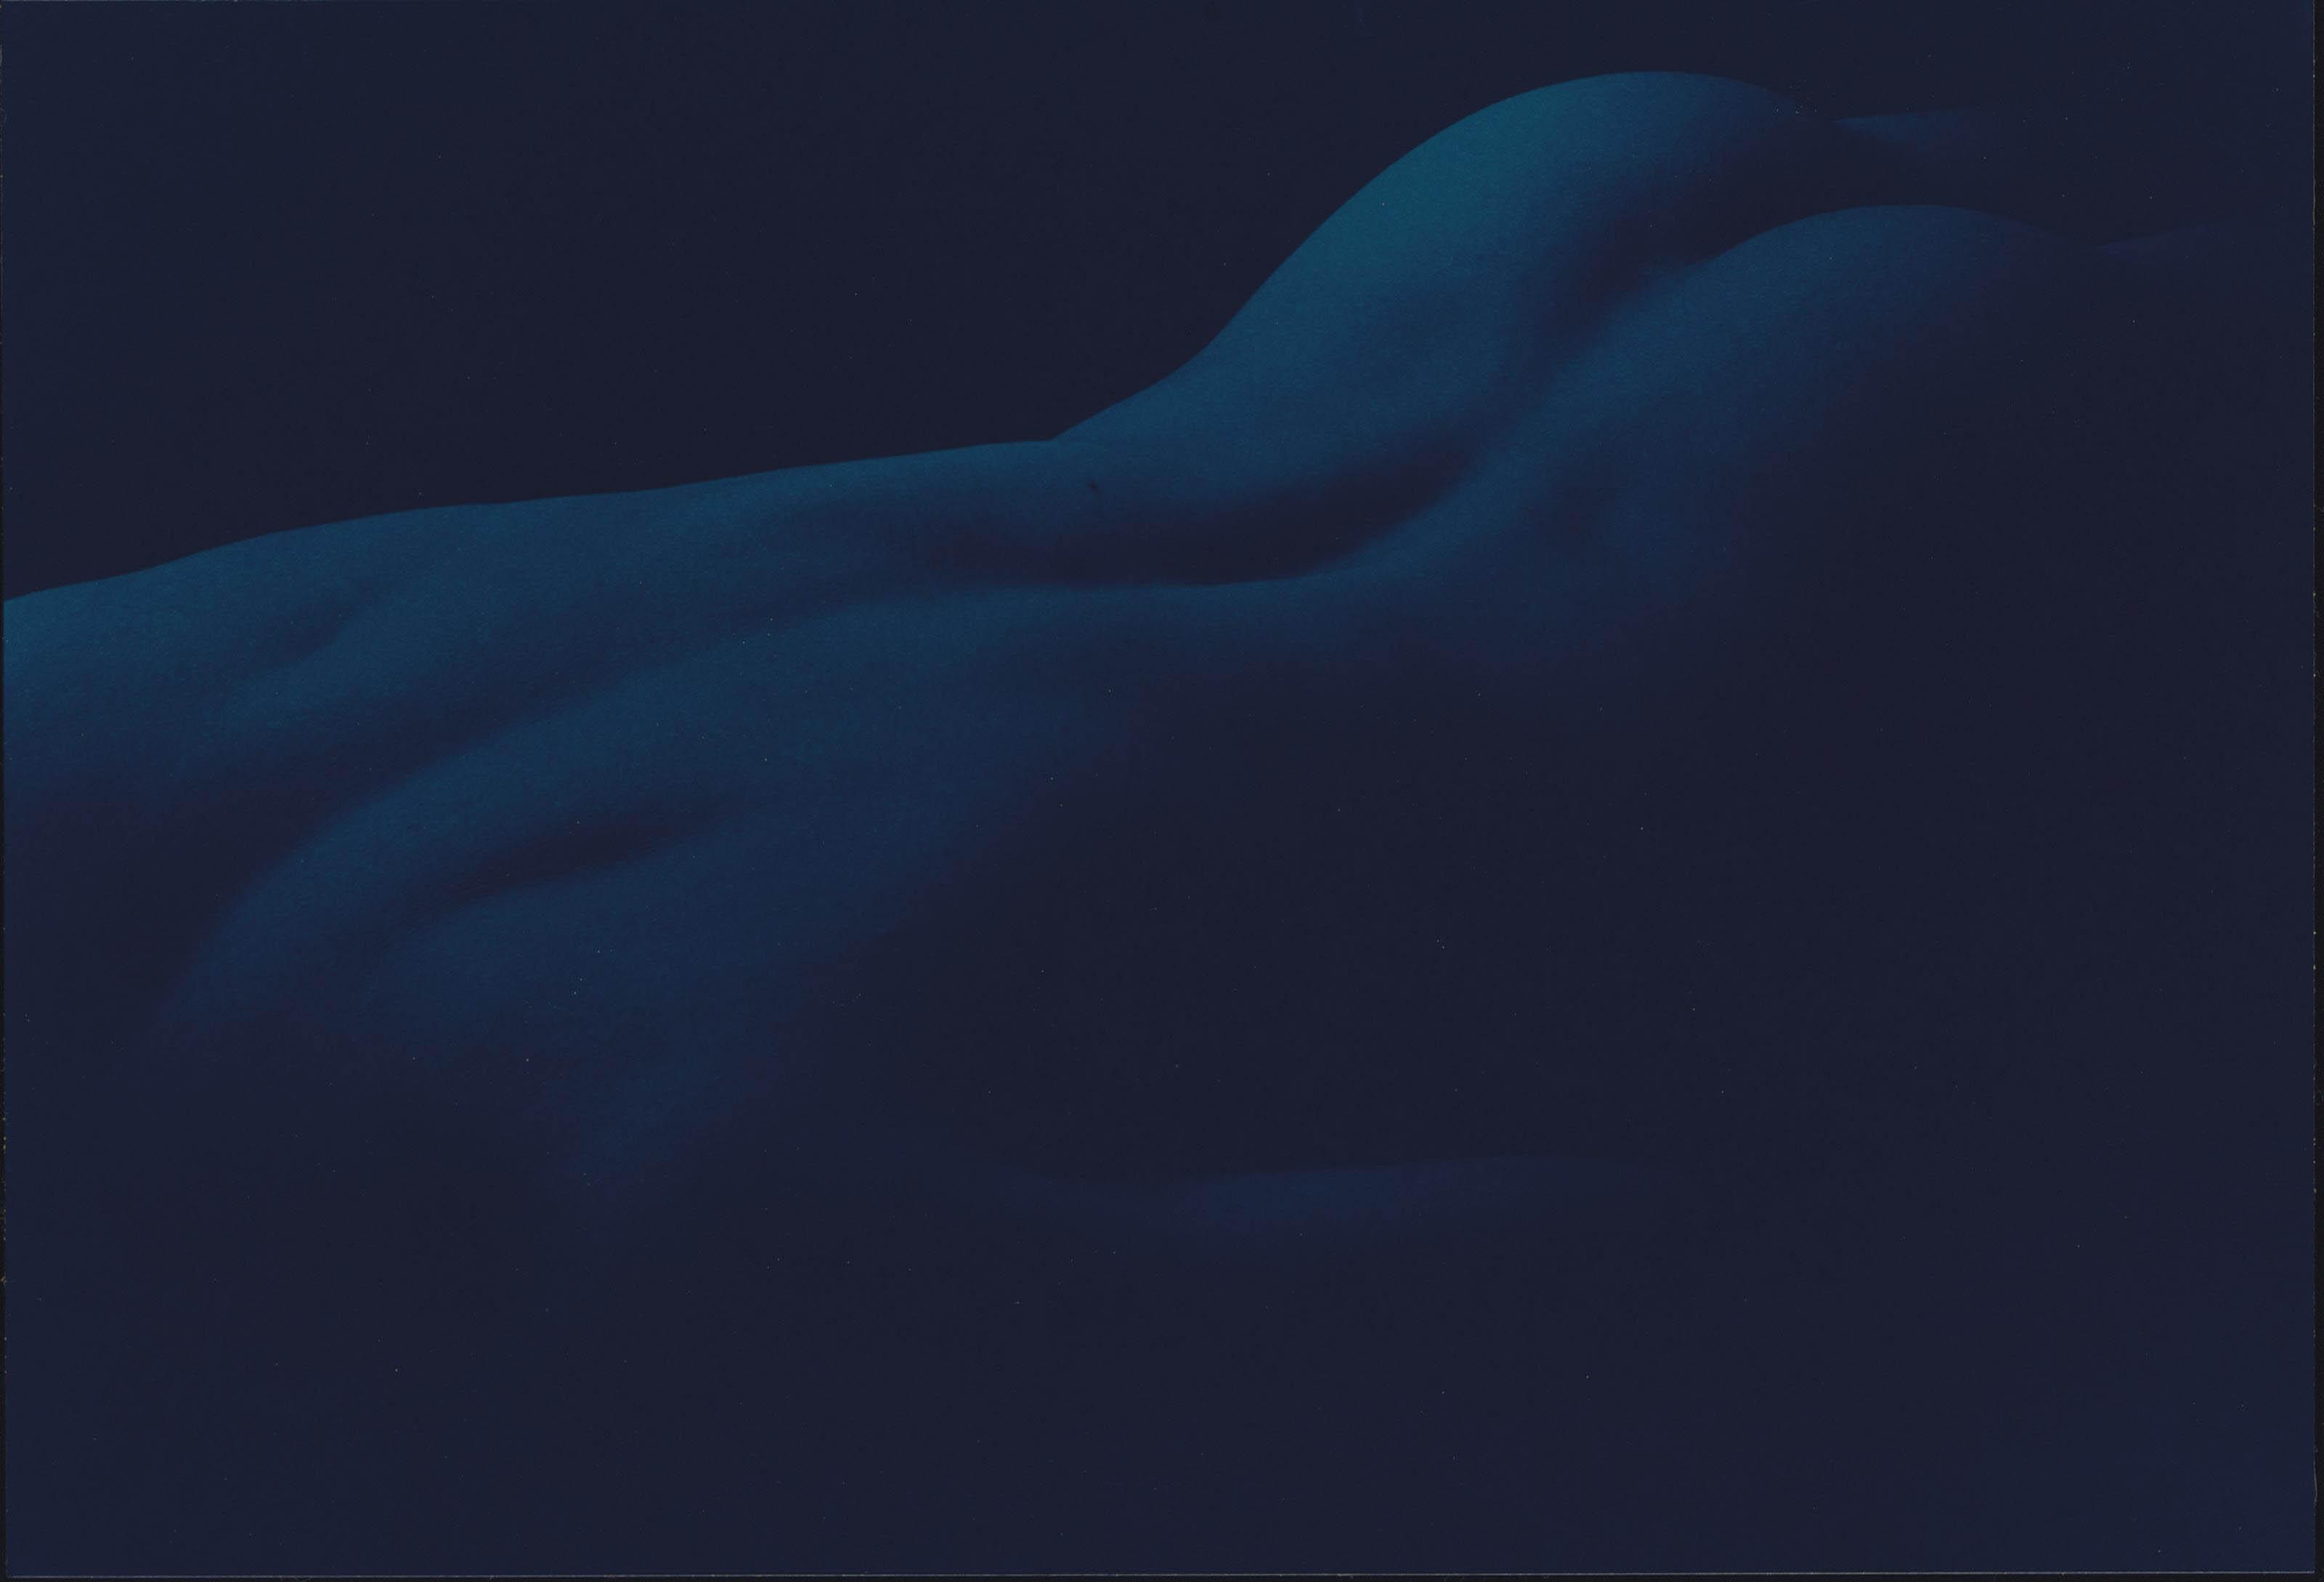 Blue, #1155B, 2004